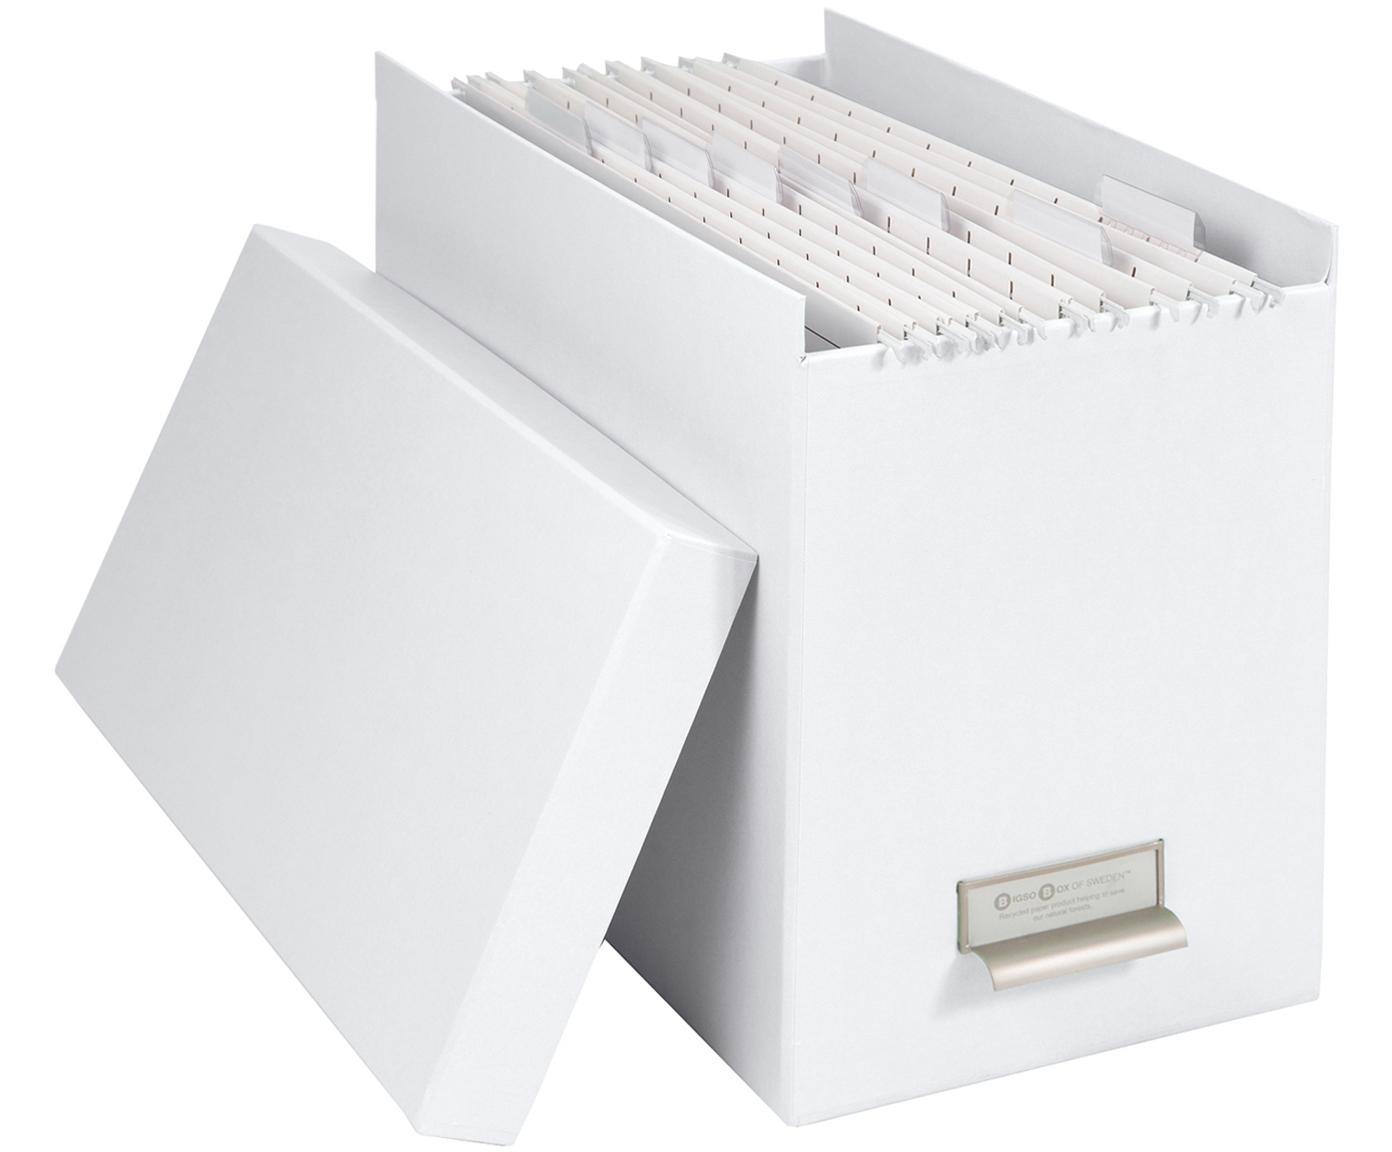 Archiefdoos Johan, 9-delig., Organizer: stevig gelamineerd karton, Organizer buitenzijde: wit. Organizer binnenzijde: wit, 19 x 27 cm